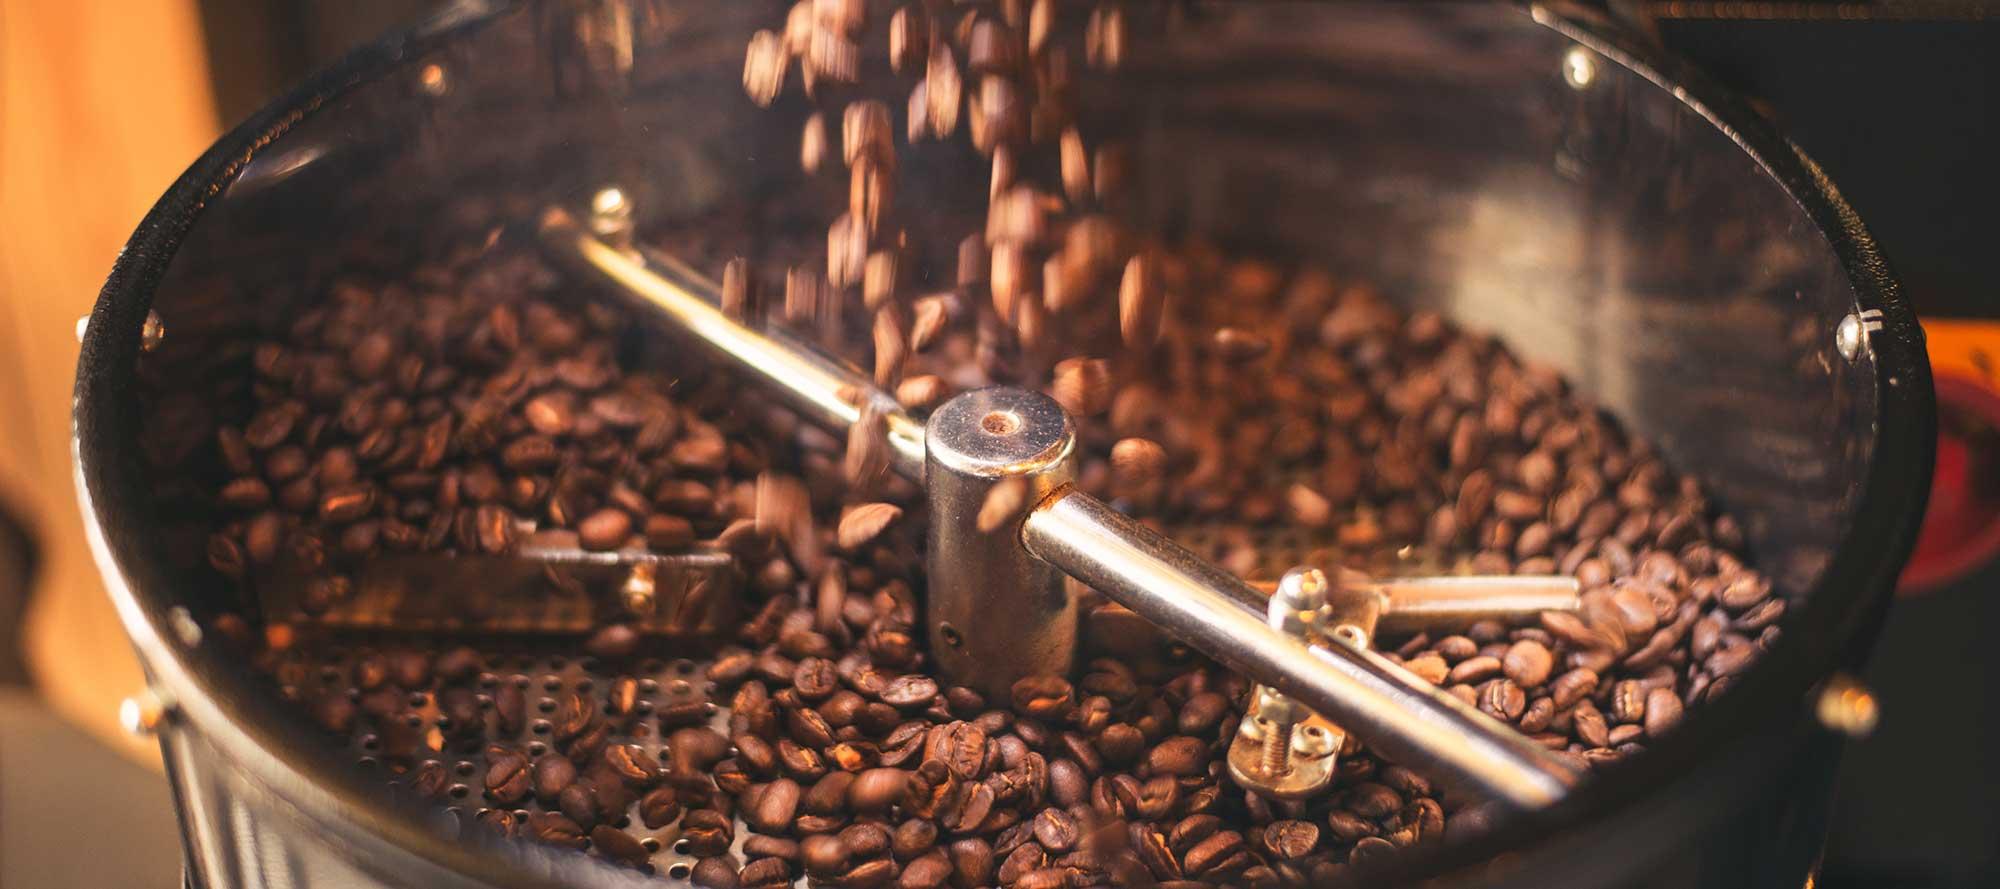 melzo-cafe-torrefazione